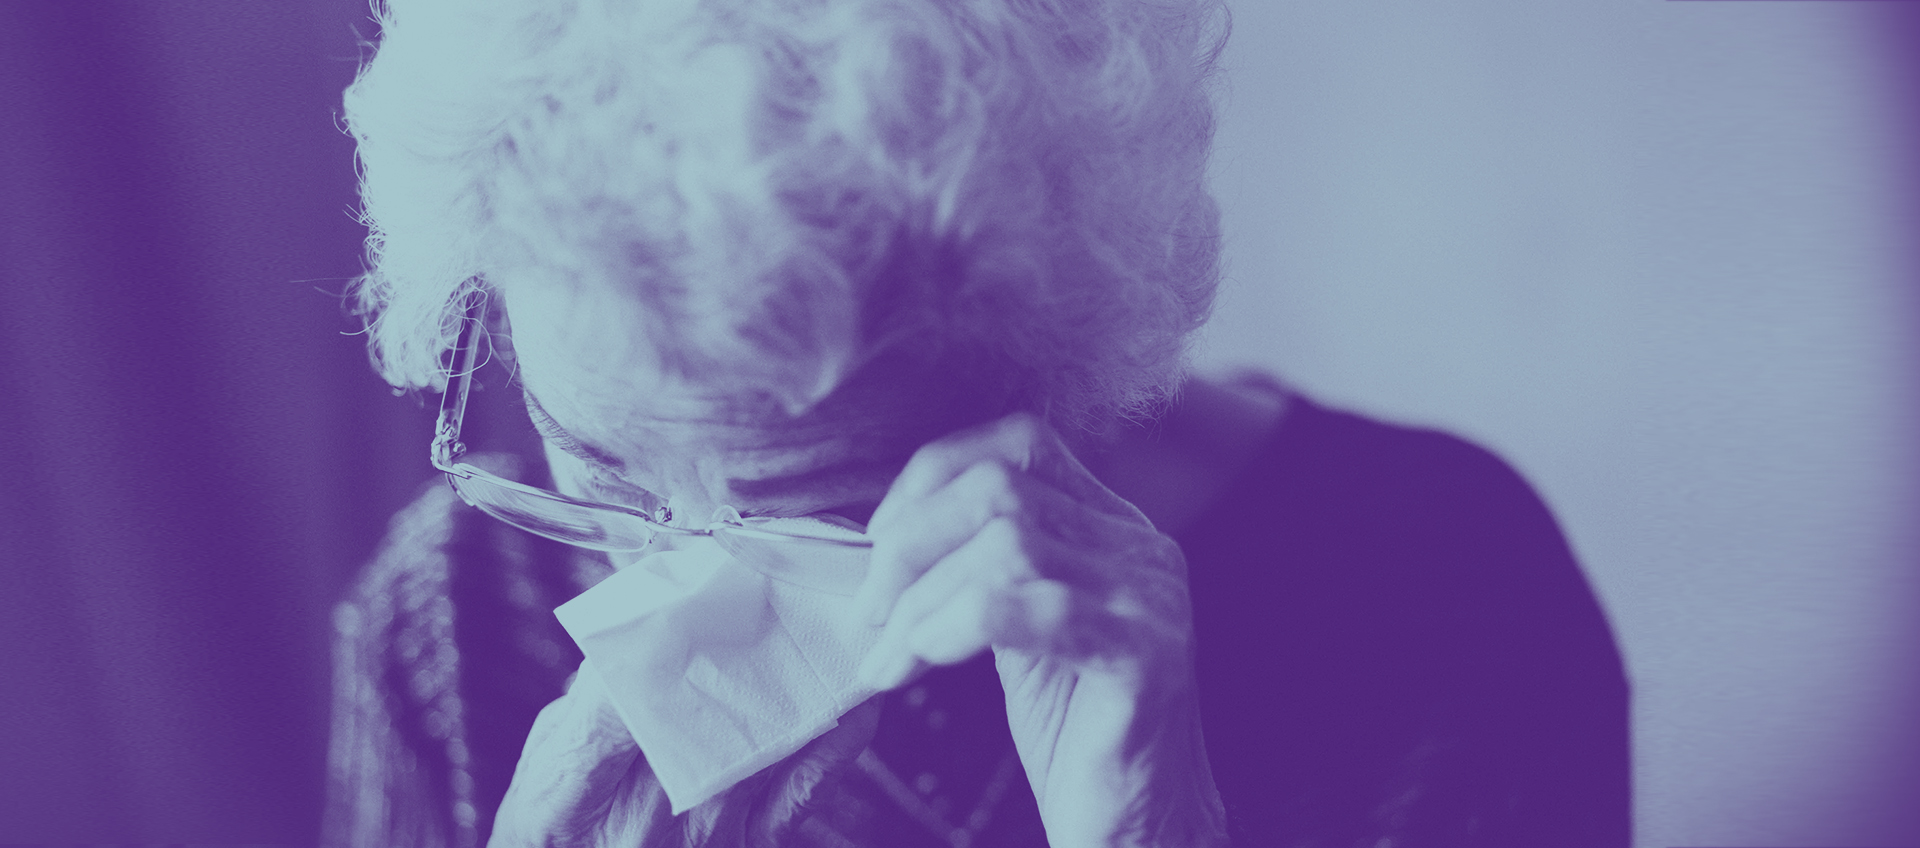 Aged care elderly